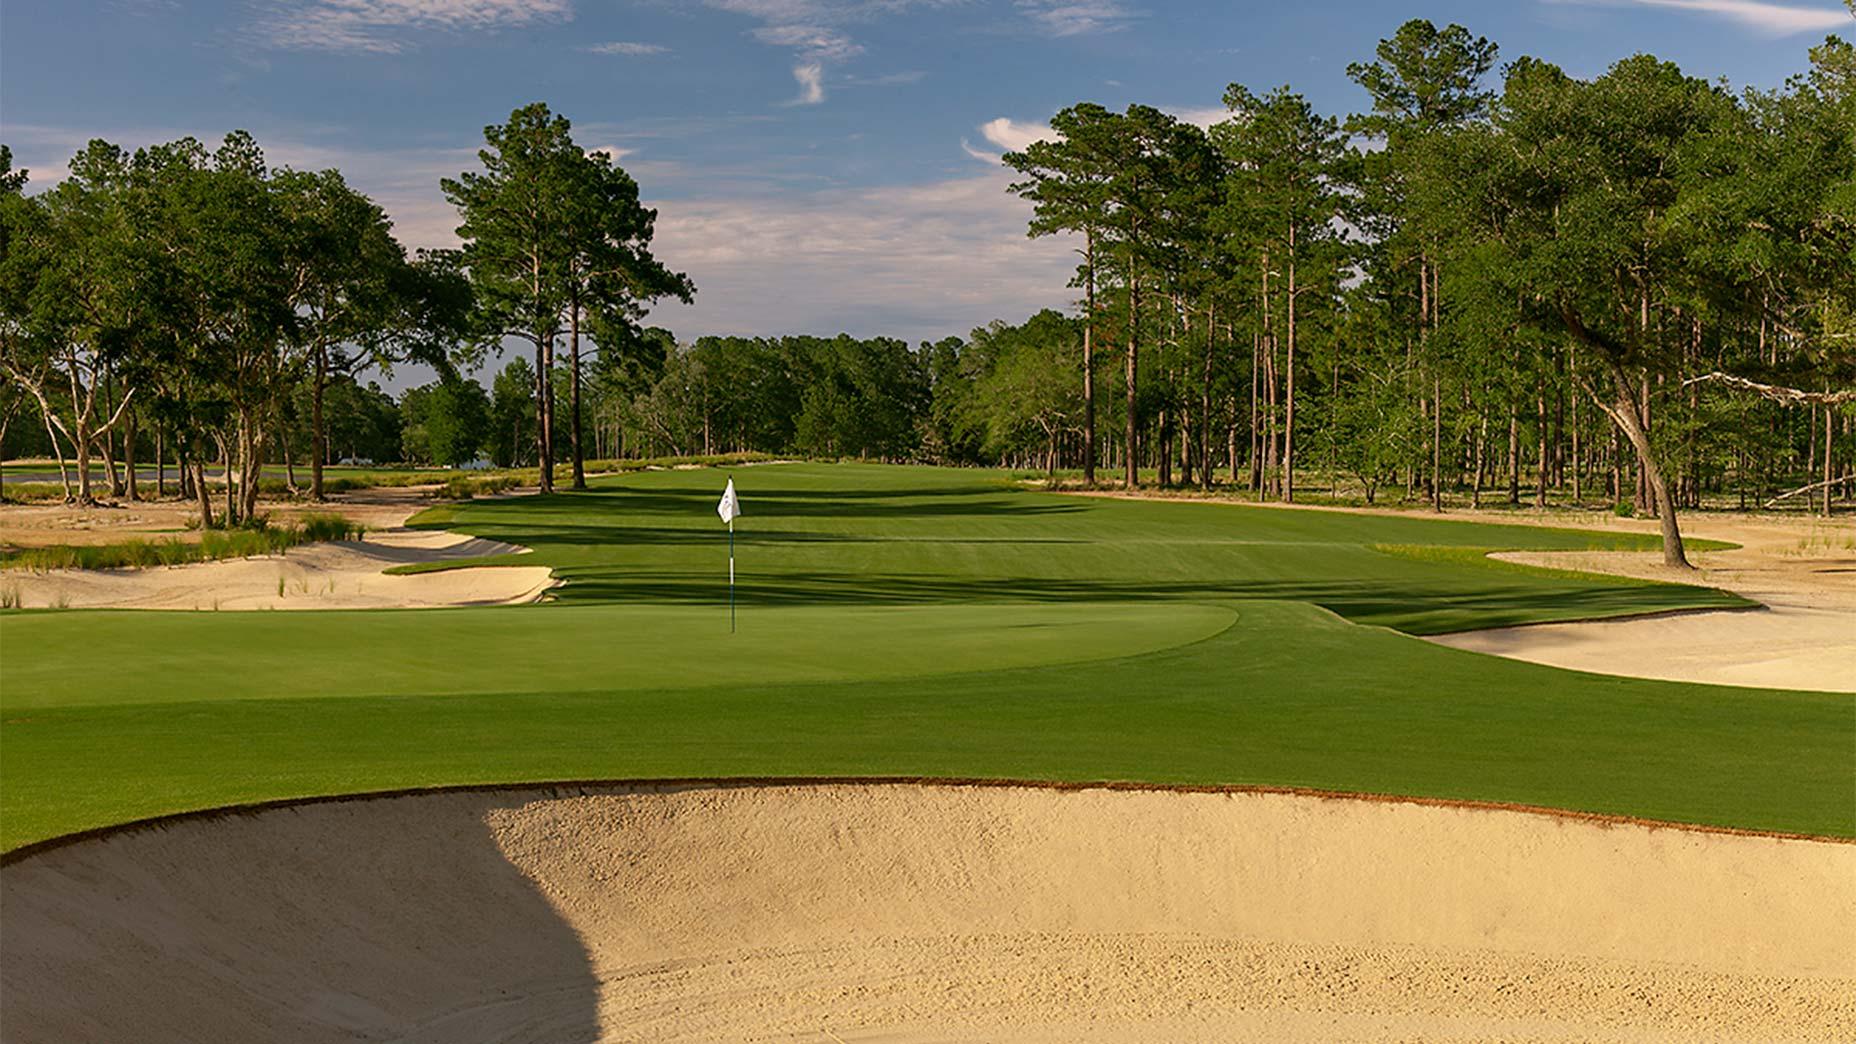 Congaree golf course